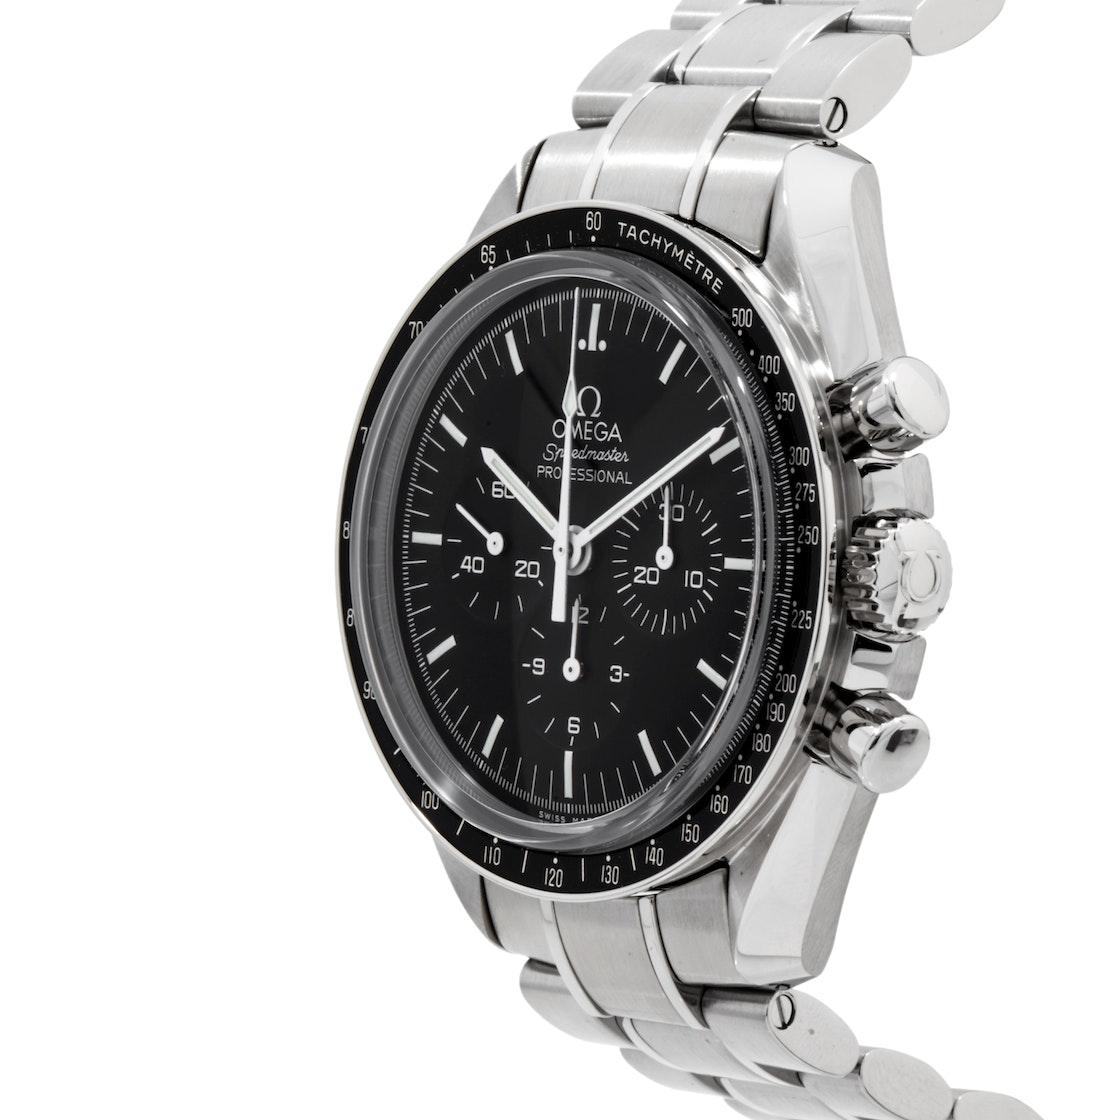 Omega Speedmaster Moonwatch 311.30.42.30.01.006